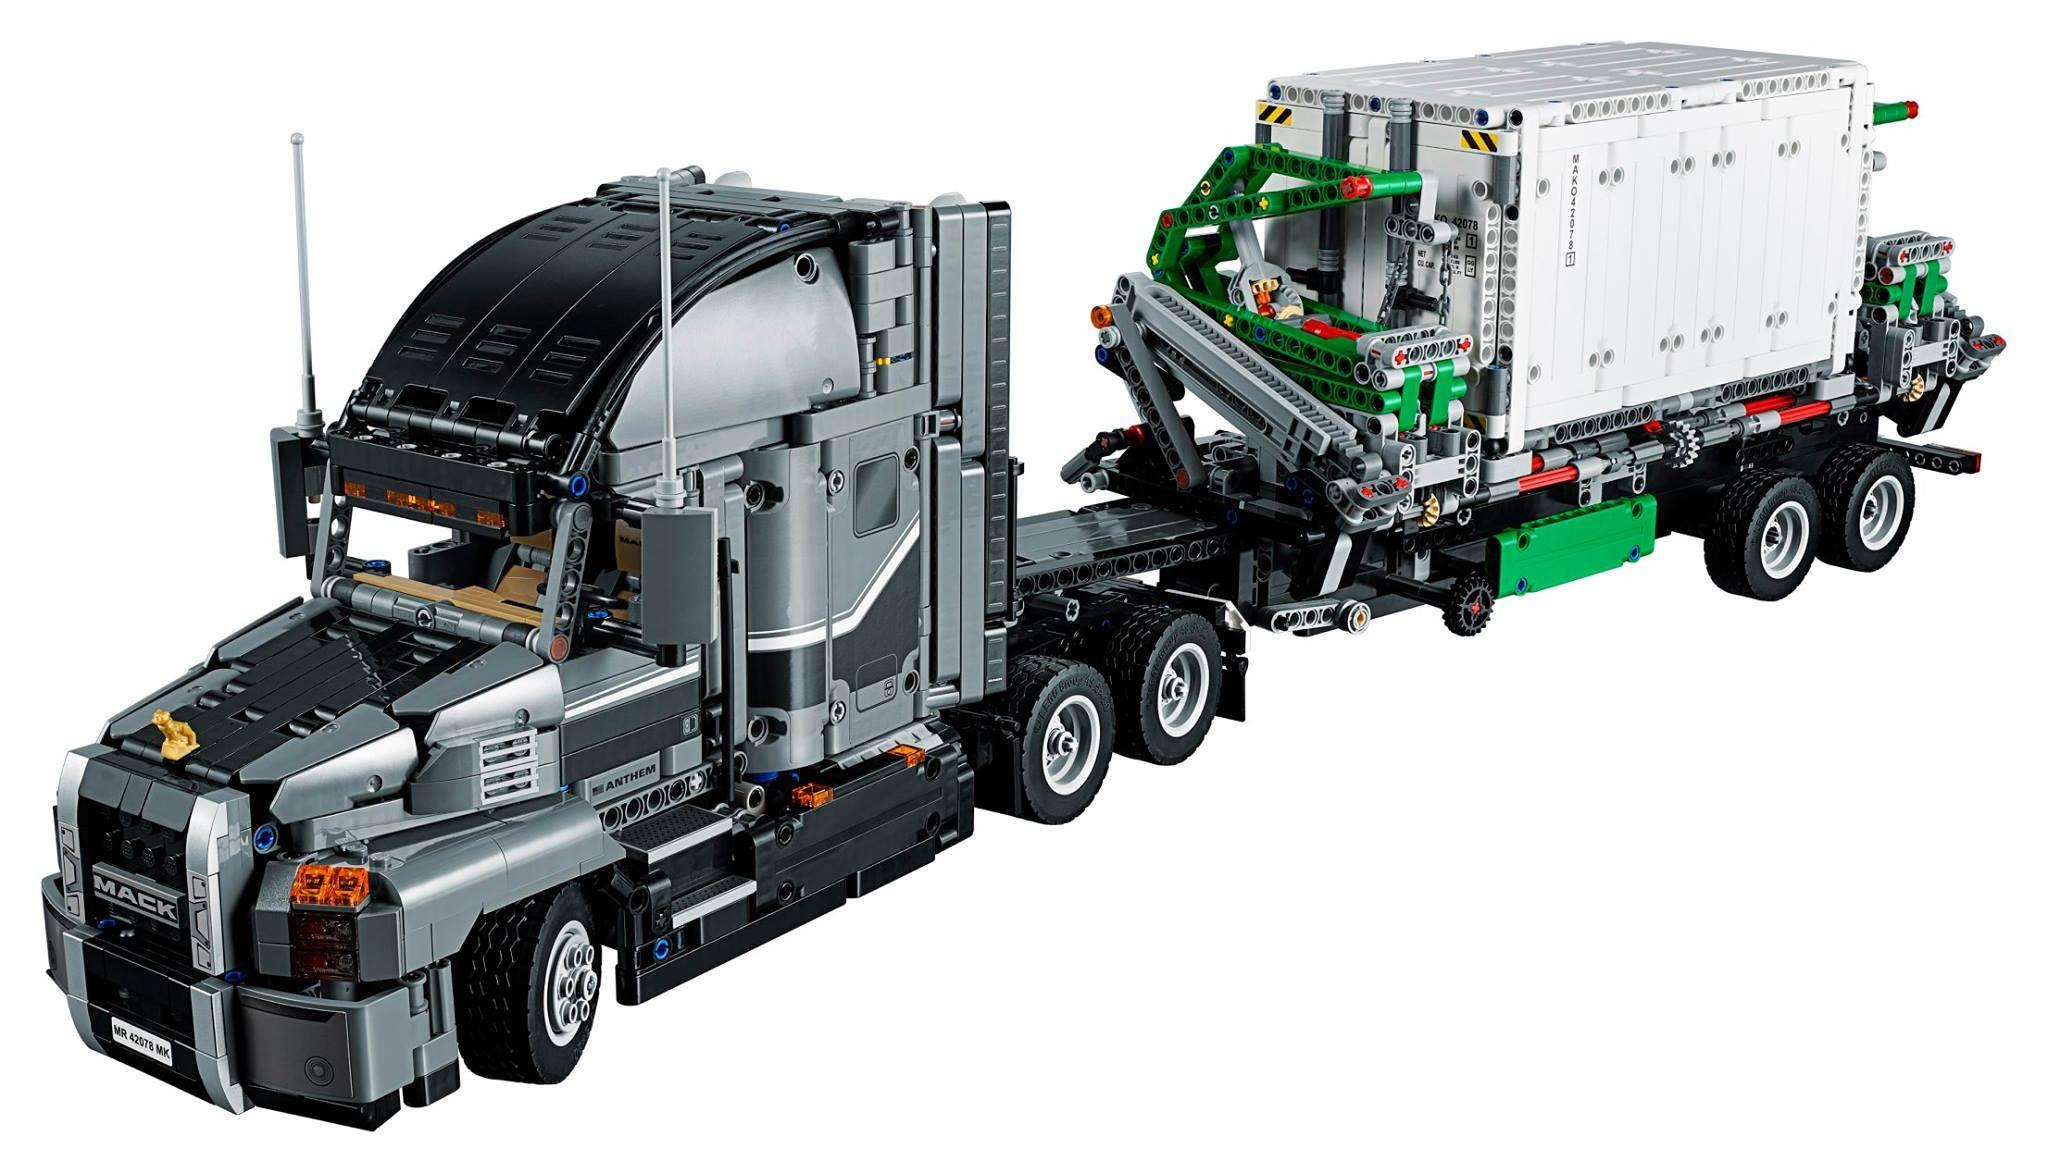 mit dem set lego technic mack truck 42078 geht es in 2018. Black Bedroom Furniture Sets. Home Design Ideas